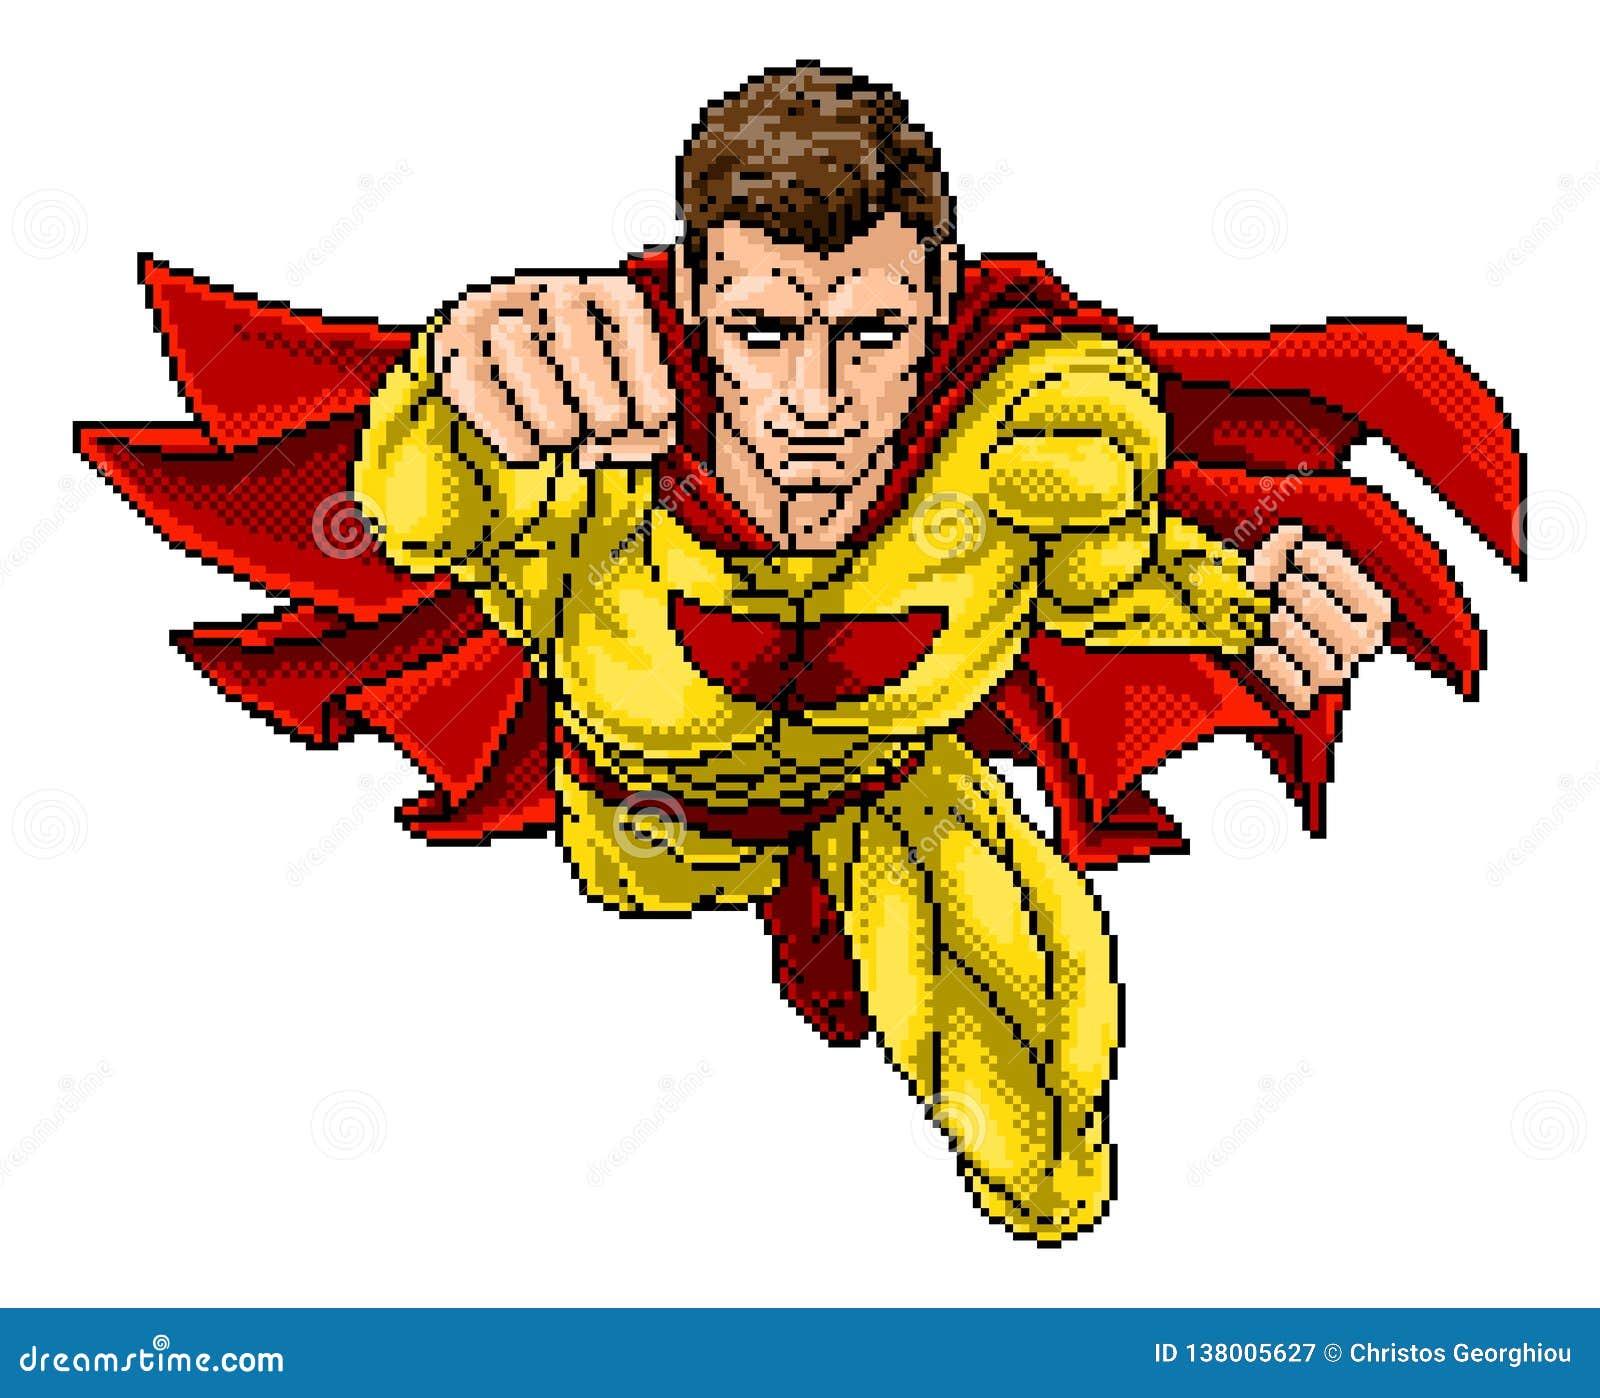 Superhero Pixel Art Arcade Game Cartoon Character Stock Vector Illustration Of Book Clip 138005627